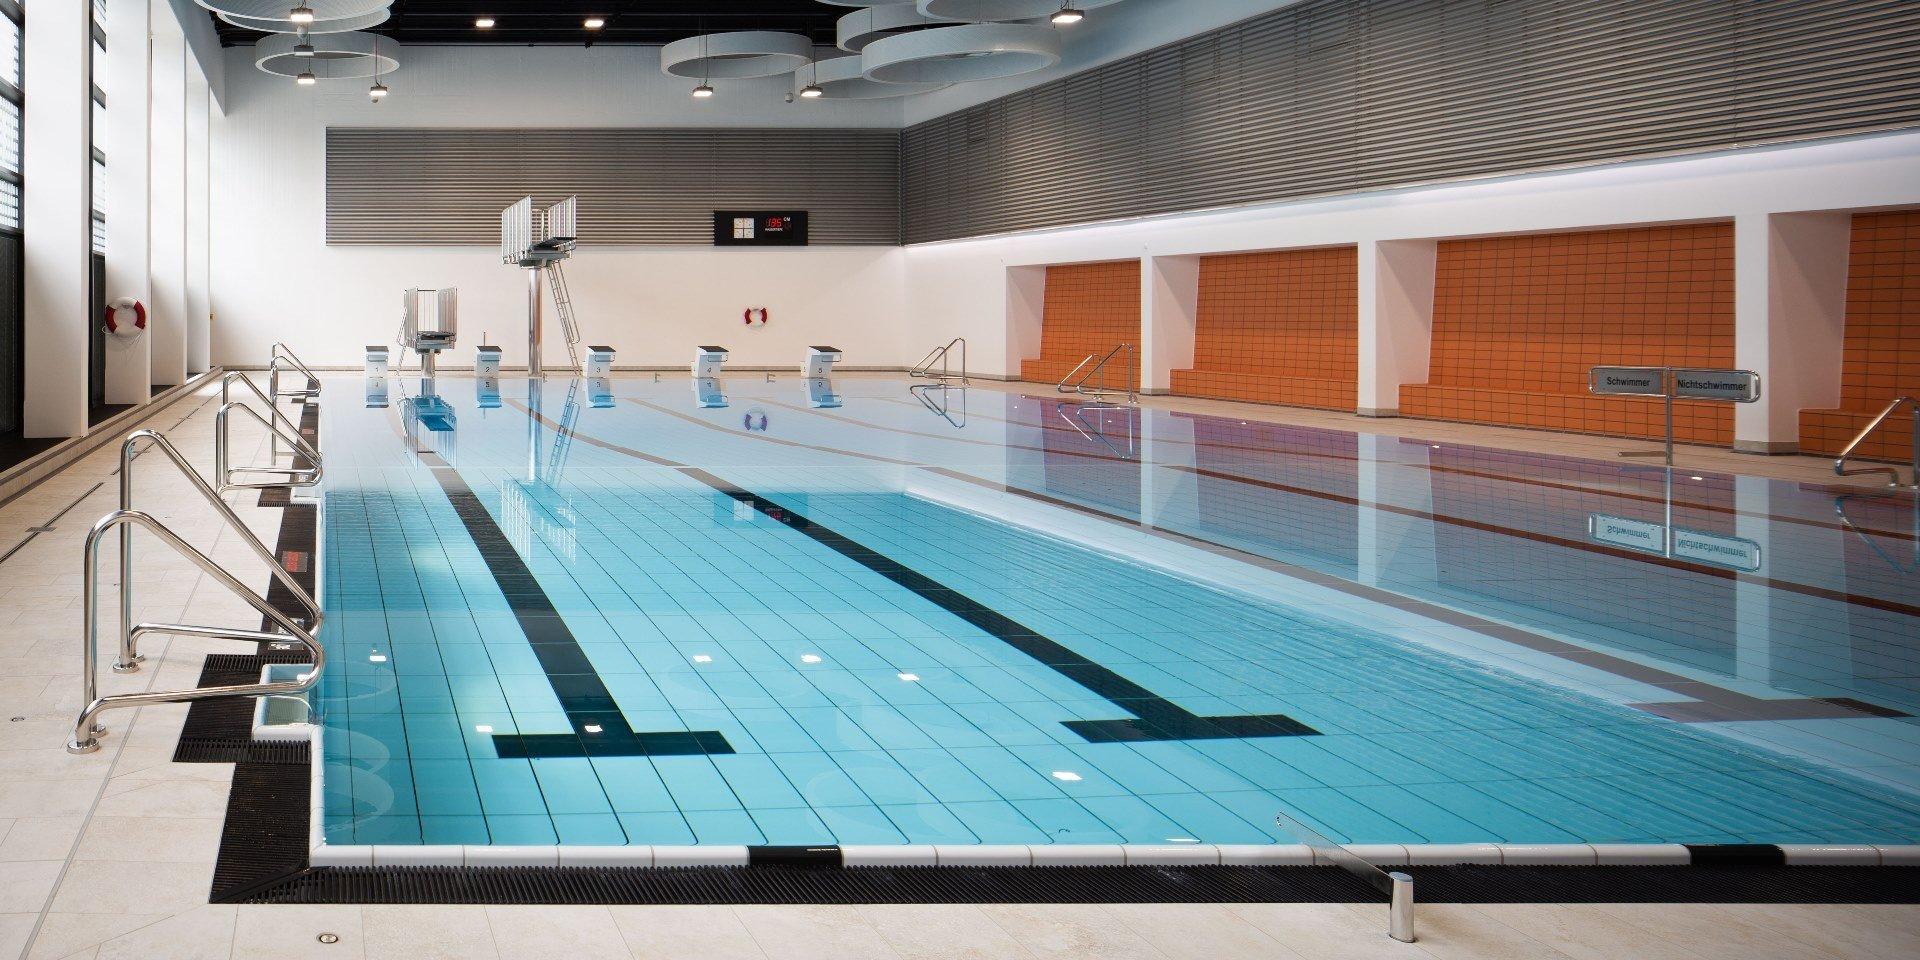 Steuler Pool Linings Sentabad München links